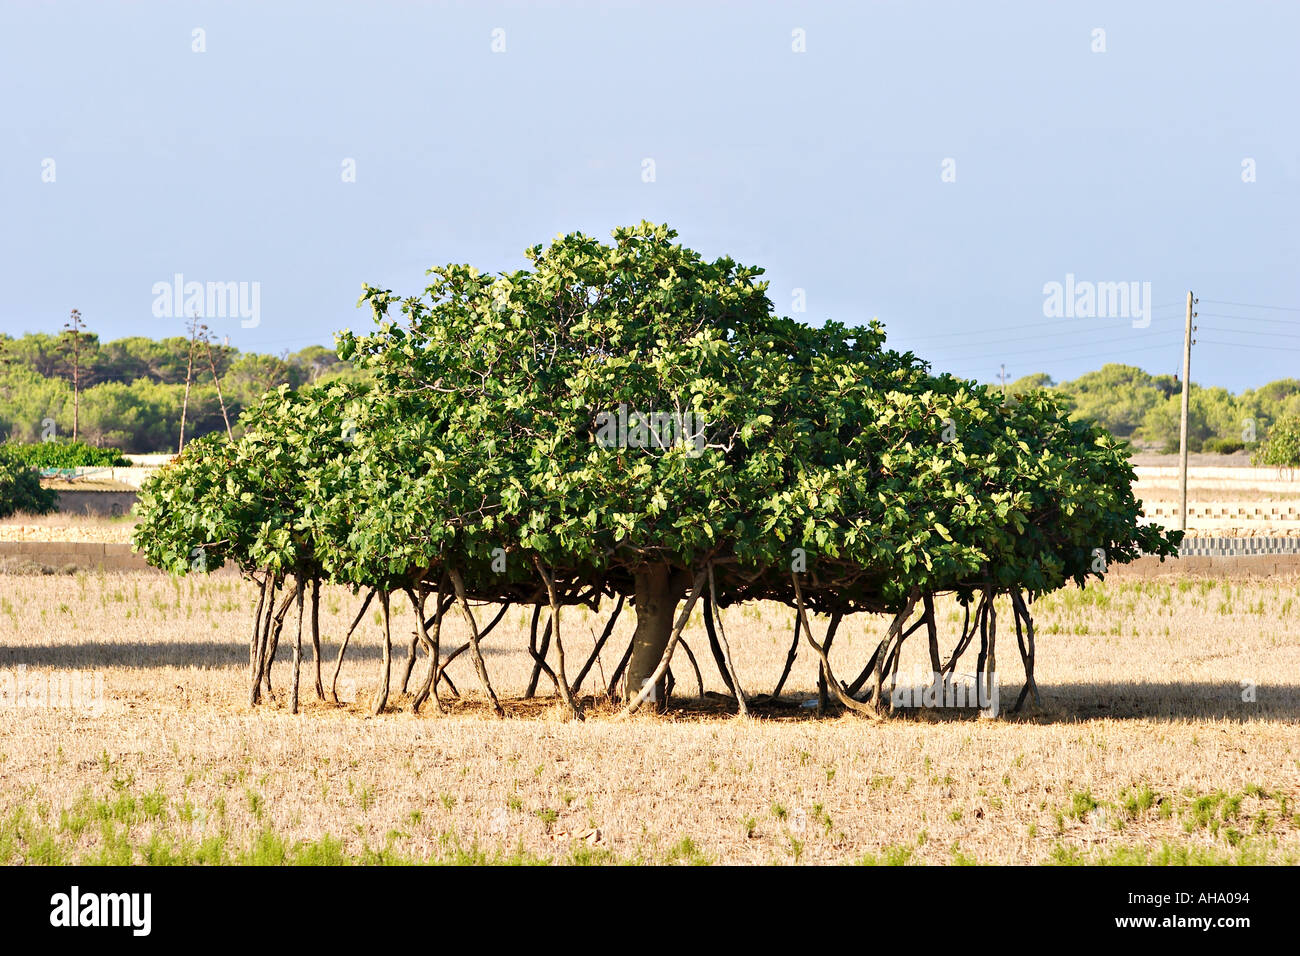 feigenbaum ficus carica auf formentera stockfoto bild. Black Bedroom Furniture Sets. Home Design Ideas